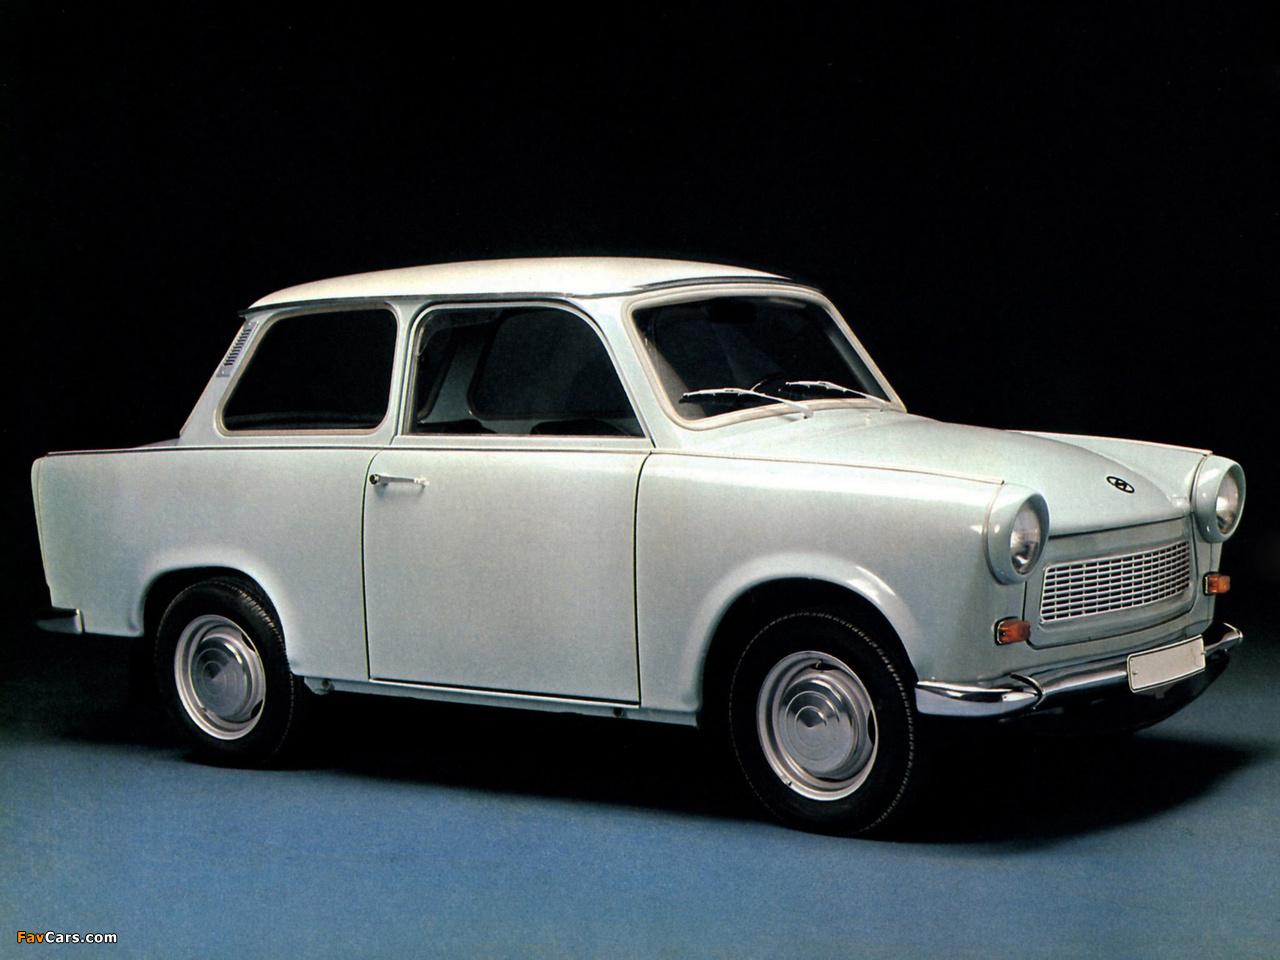 trabant 601 1963 89 wallpapers 1280x960. Black Bedroom Furniture Sets. Home Design Ideas